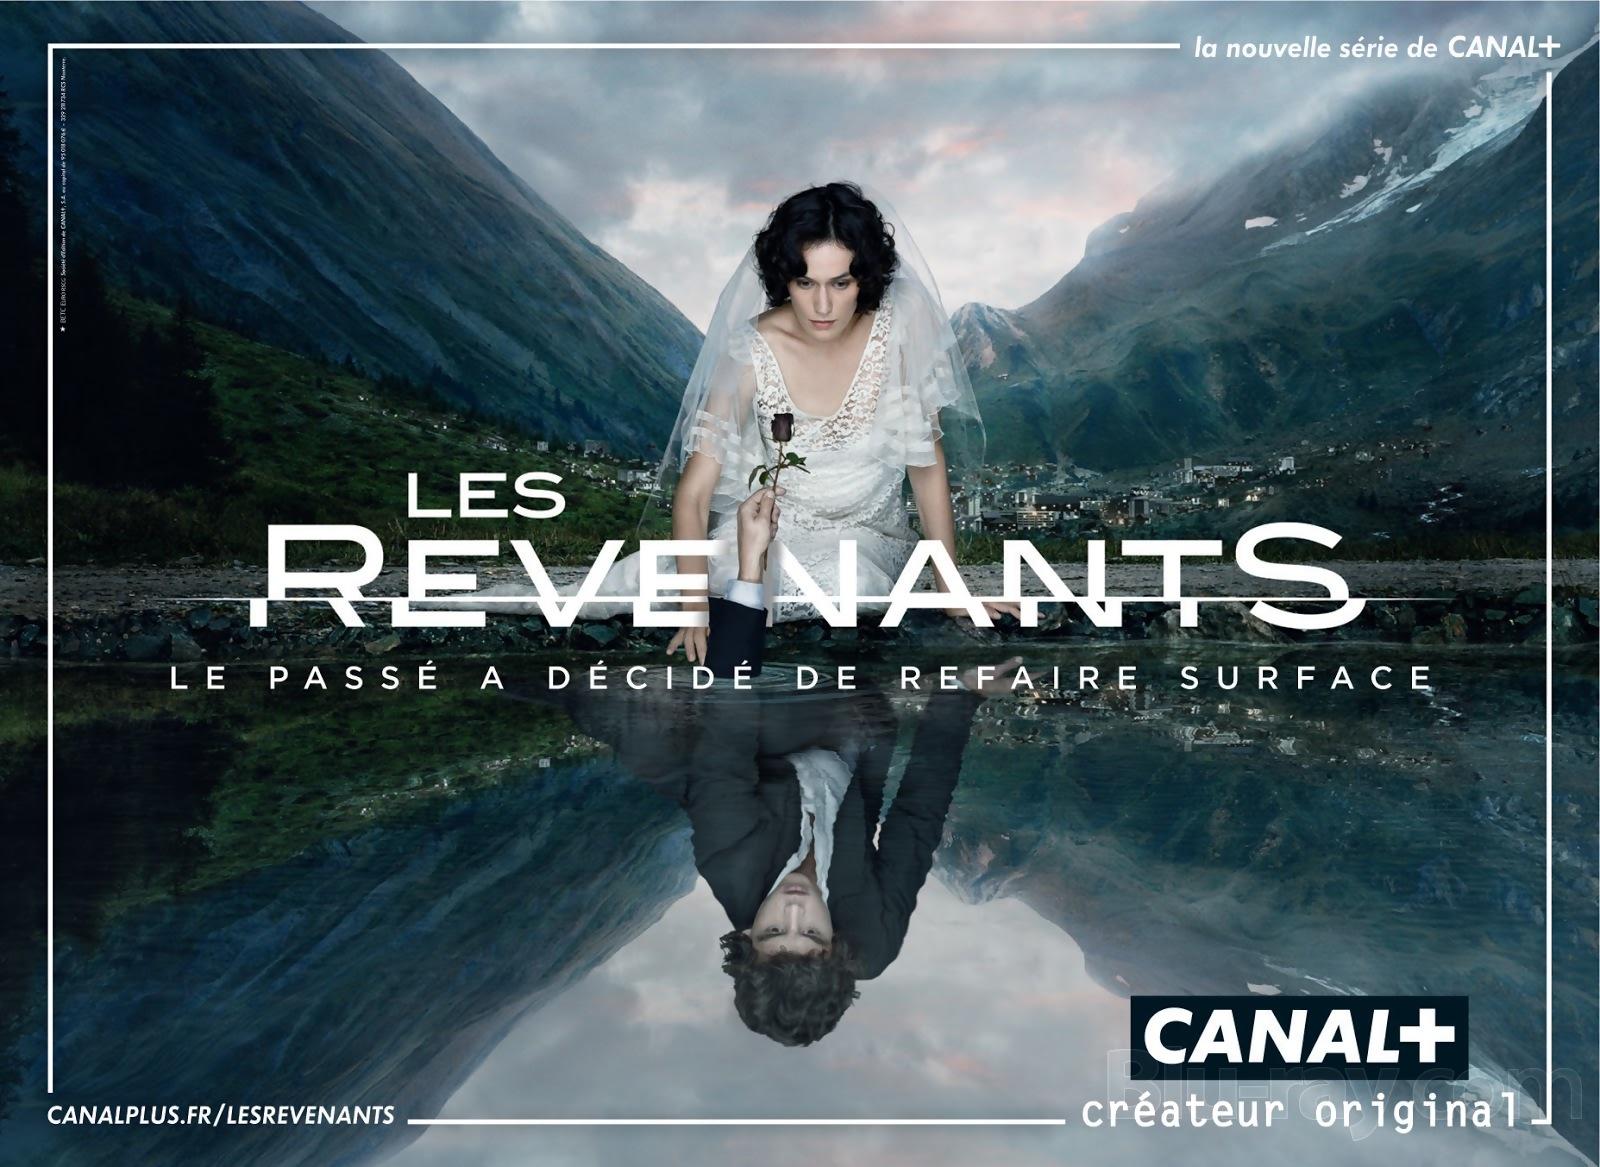 TV-Tipp: Les Revenants im WDR